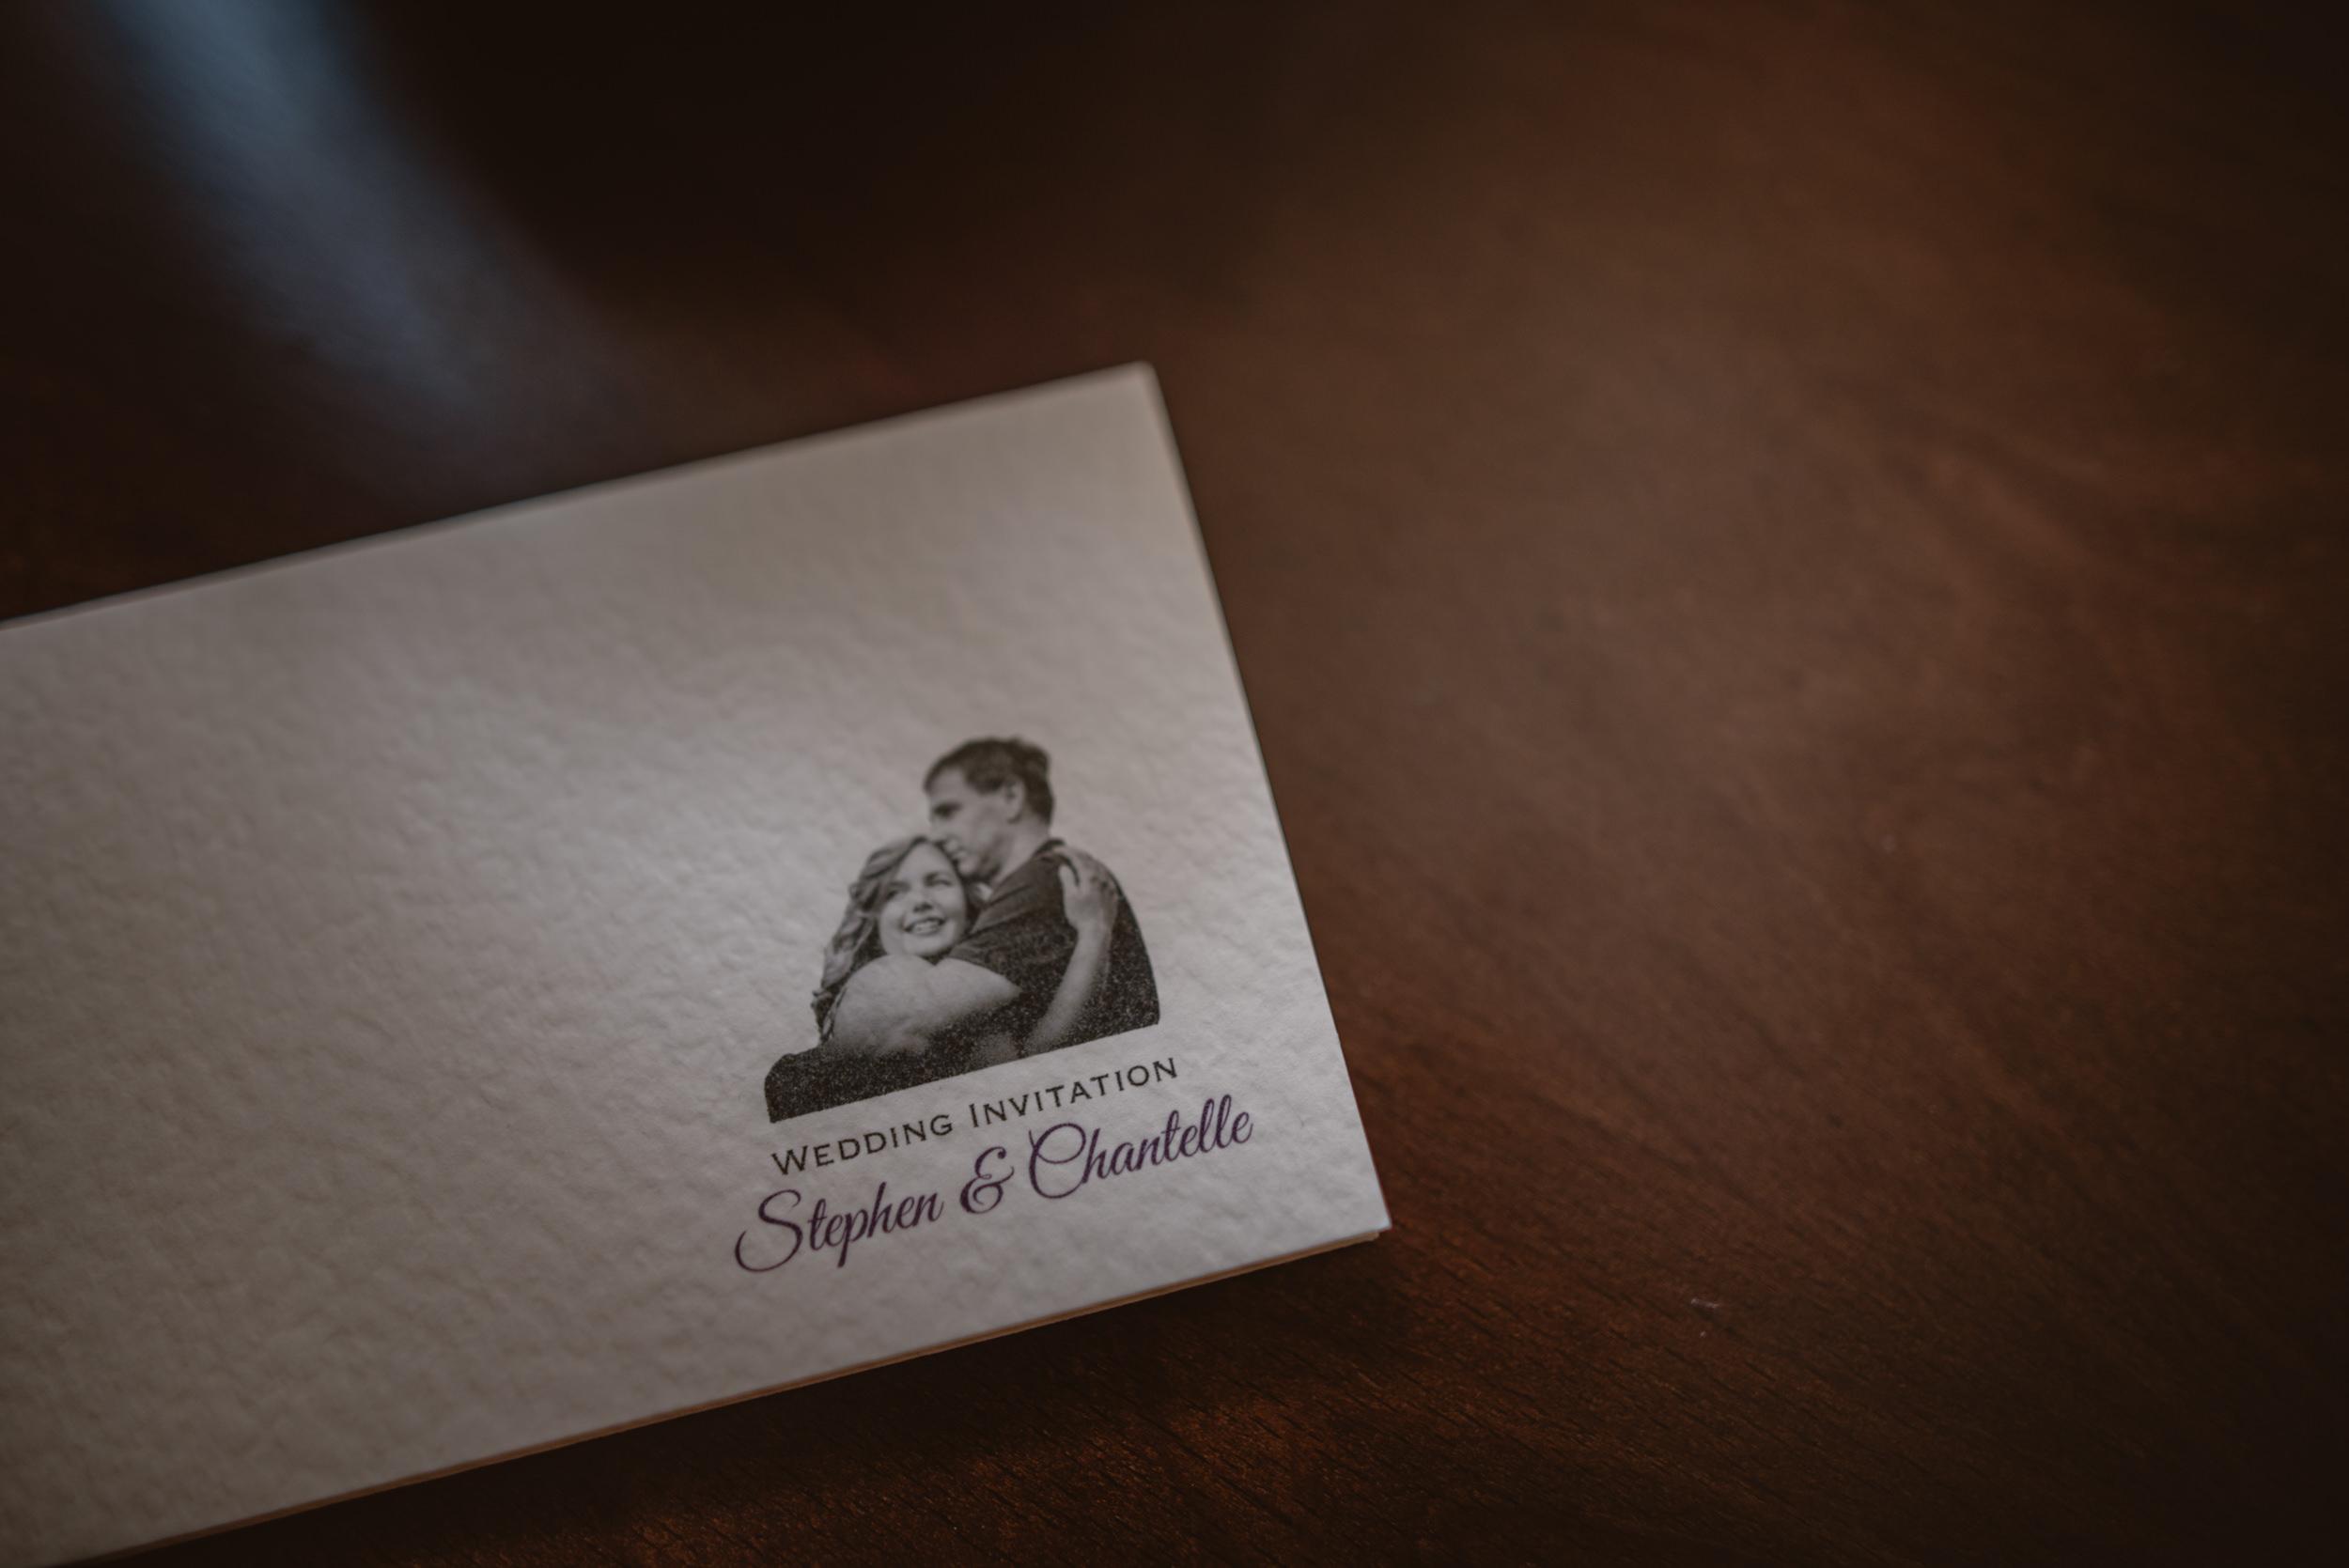 Chantelle-and-Stephen-Old-Thorns-Hotel-Wedding-Liphook-Manu-Mendoza-Wedding-Photography-096.jpg